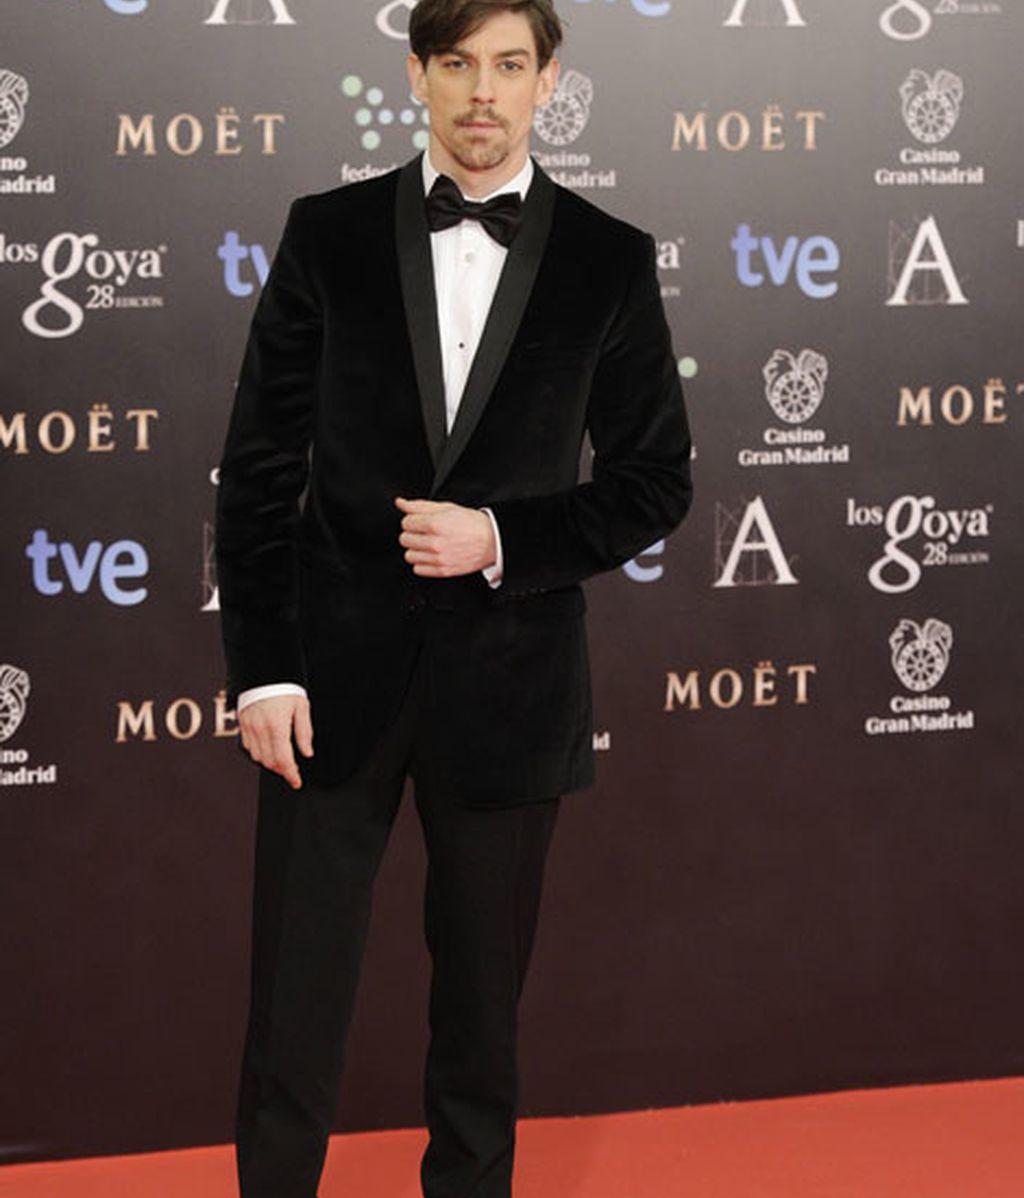 Adrian Lastra de Dolce Gabbana